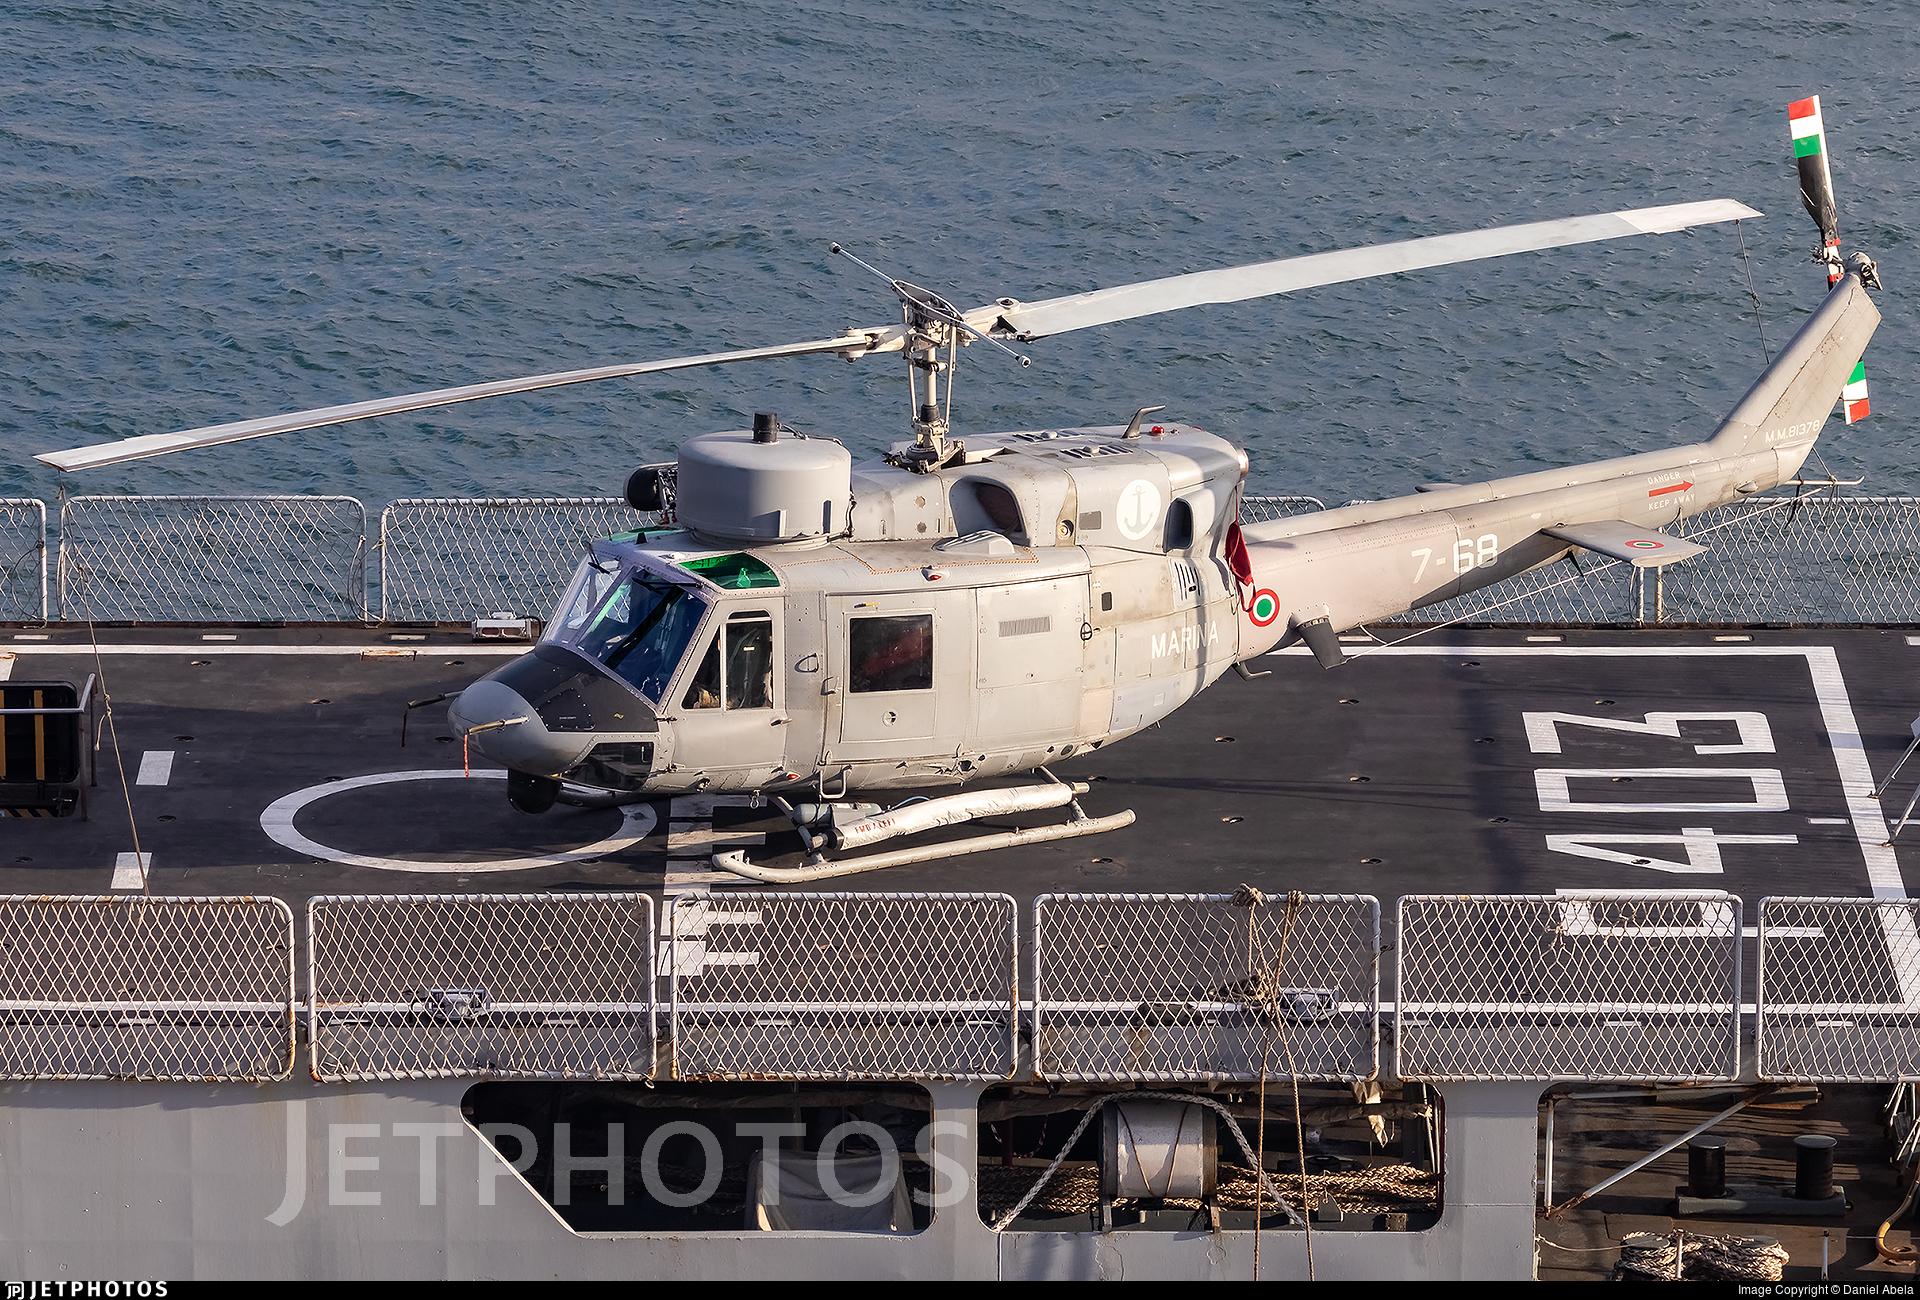 MM81378 - Agusta-Bell AB-212ASW - Italy - Navy